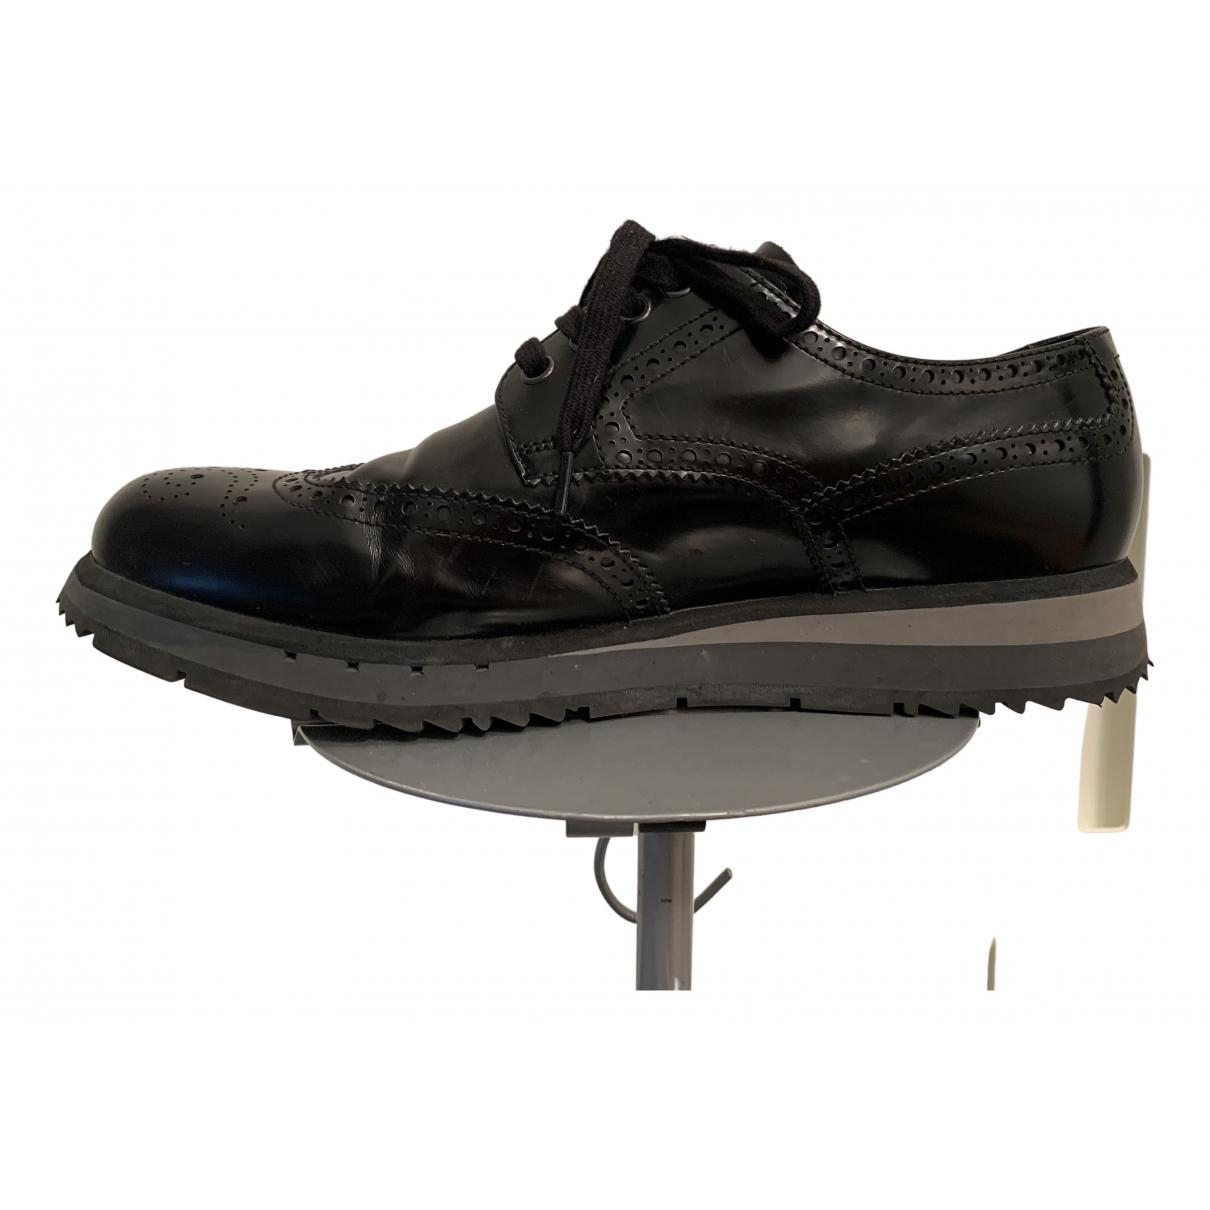 Prada \N Black Leather Lace ups for Men 8.5 UK